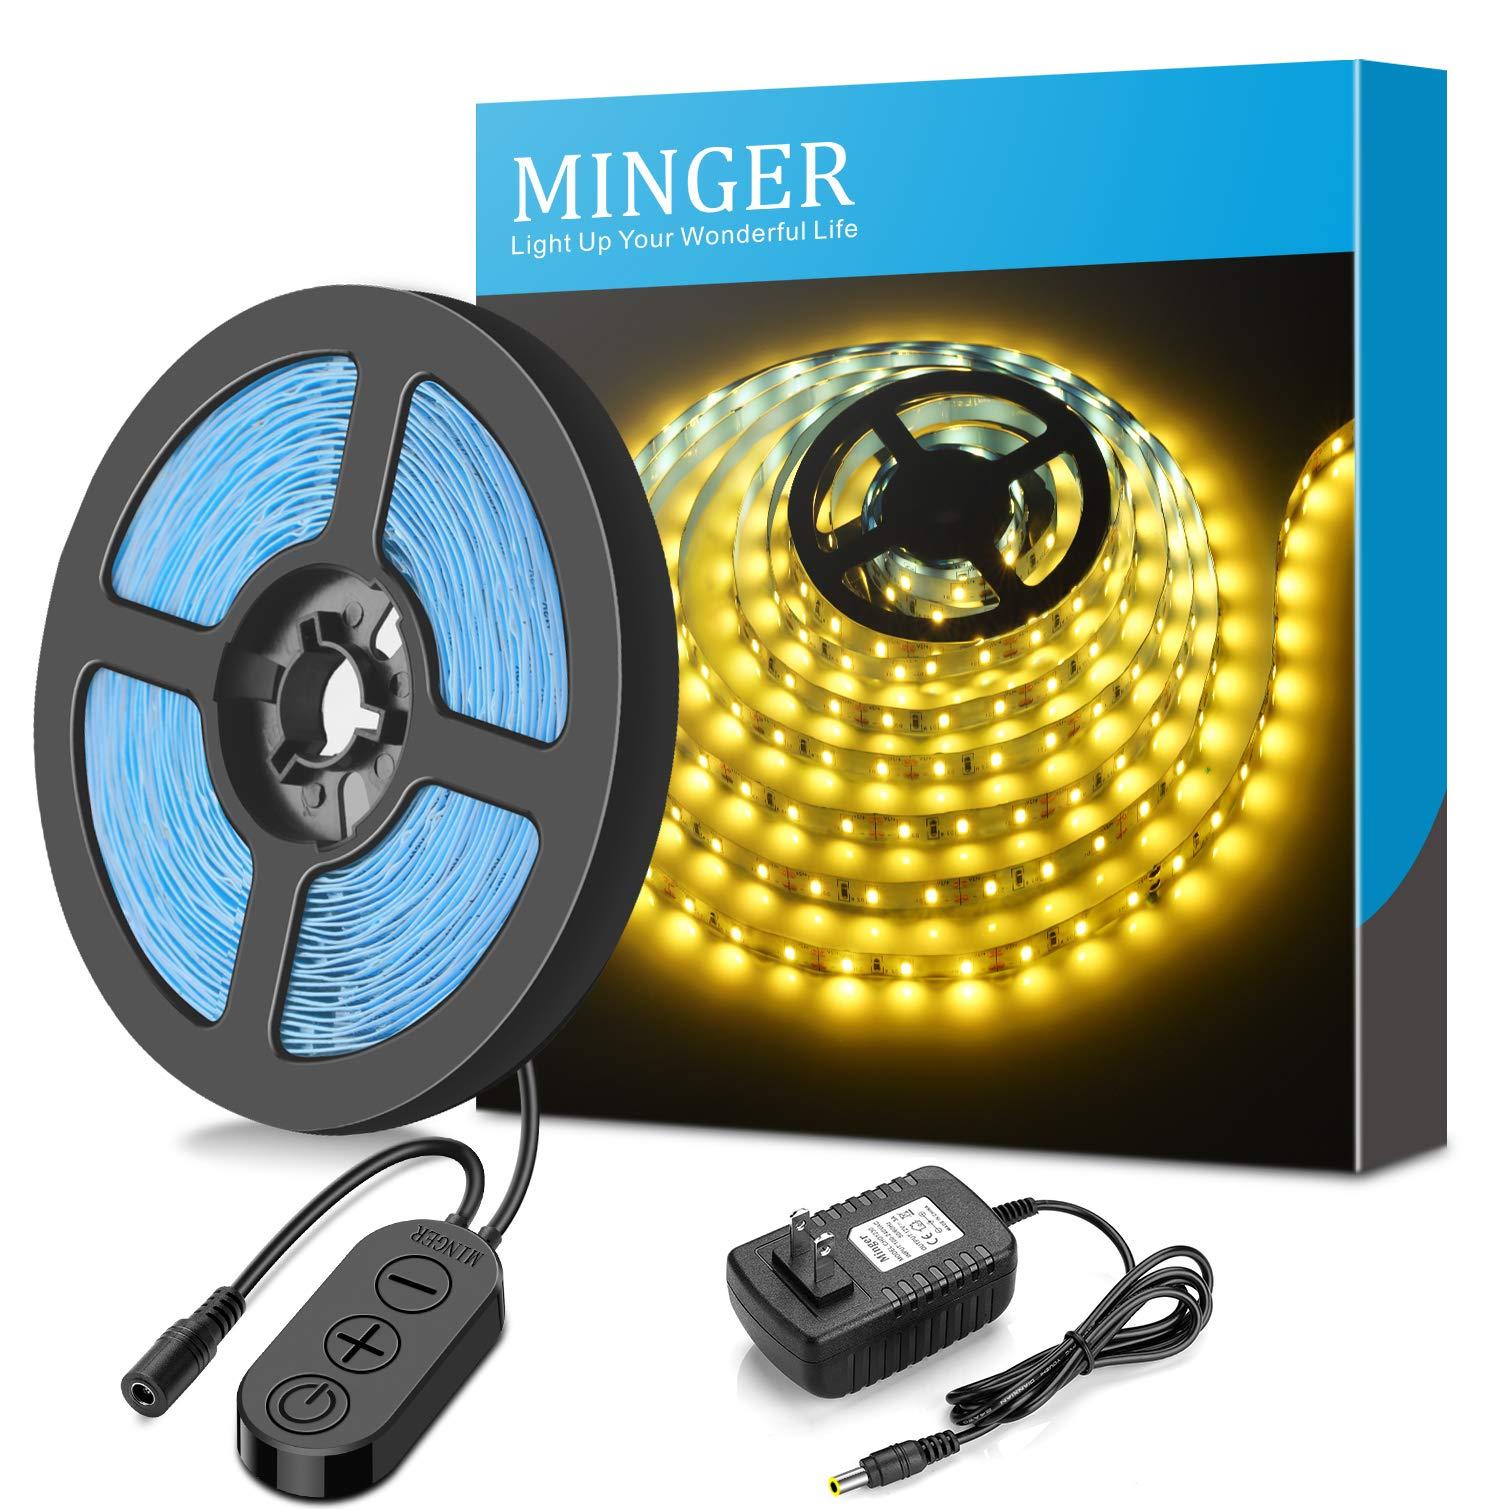 MINGER Dimmable LED Light Strip kit with UL Listed Power Supply, 300 Units SMD 2835 LEDs Flexible Strip Lights, 16.4ft 12V LED Ribbon, Non-Waterproof, 3500K Warm White Lighting Strips, DIY LED Tape